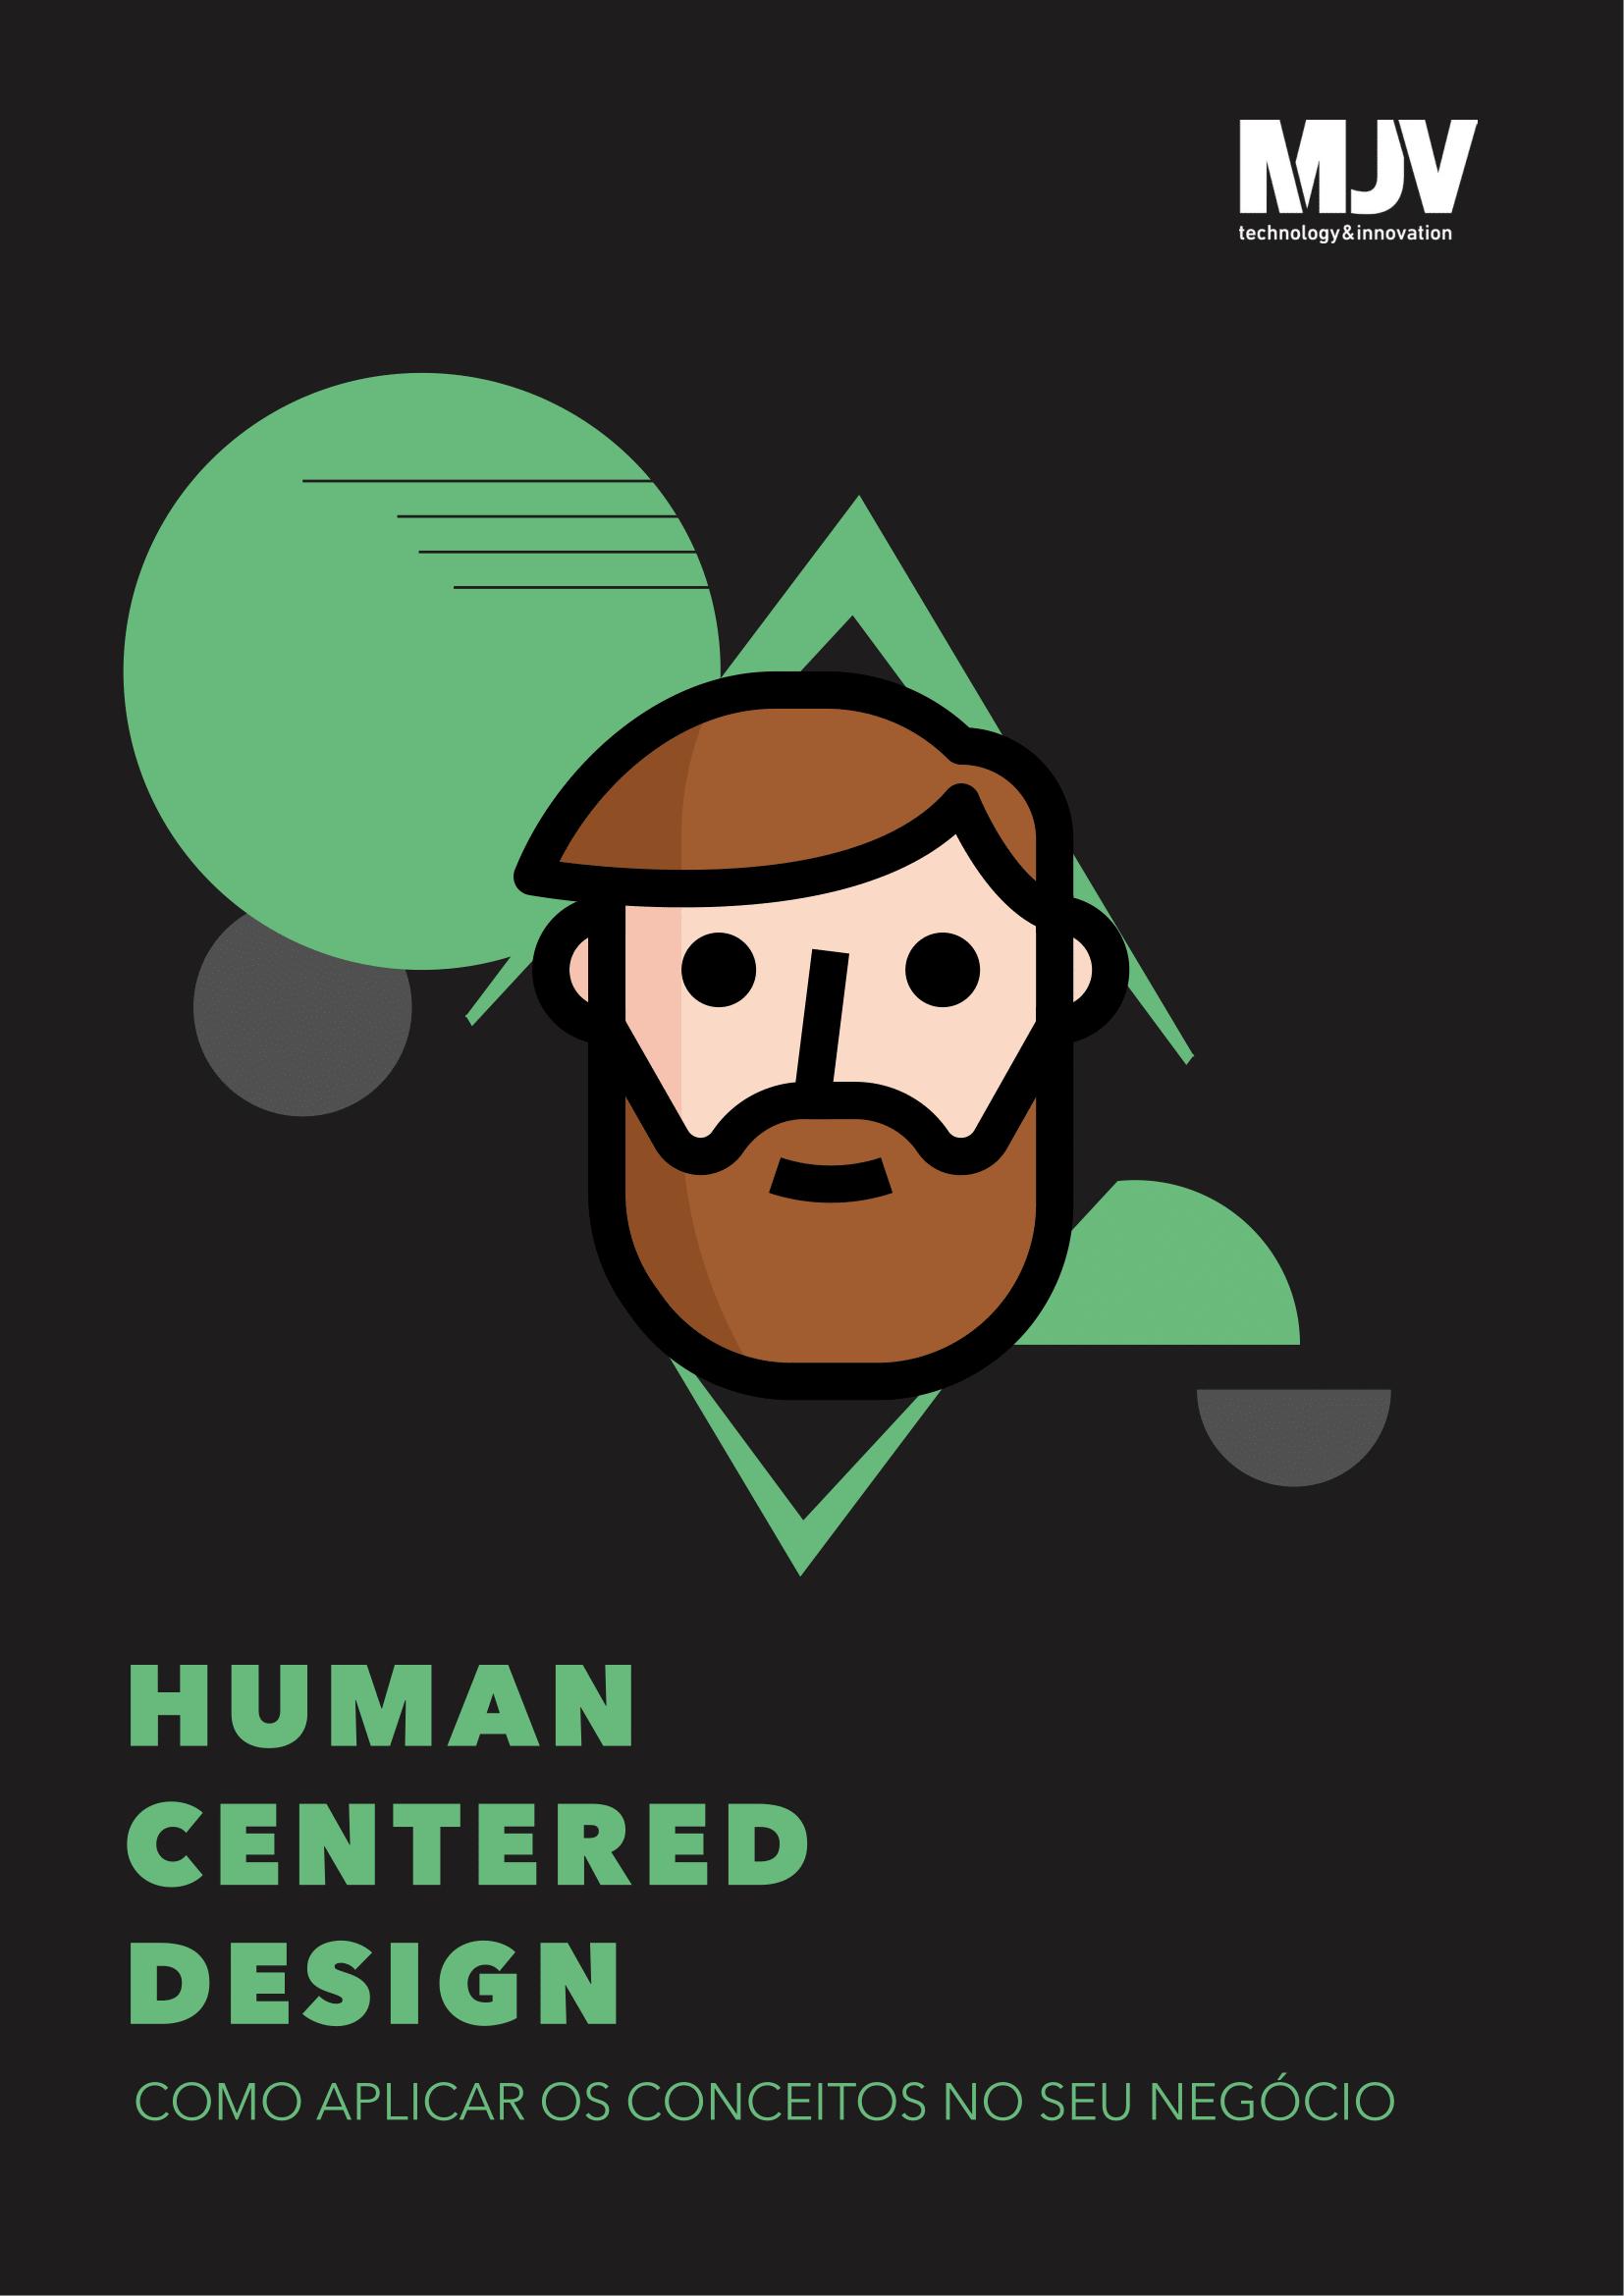 Ebook_human-centered-design-01